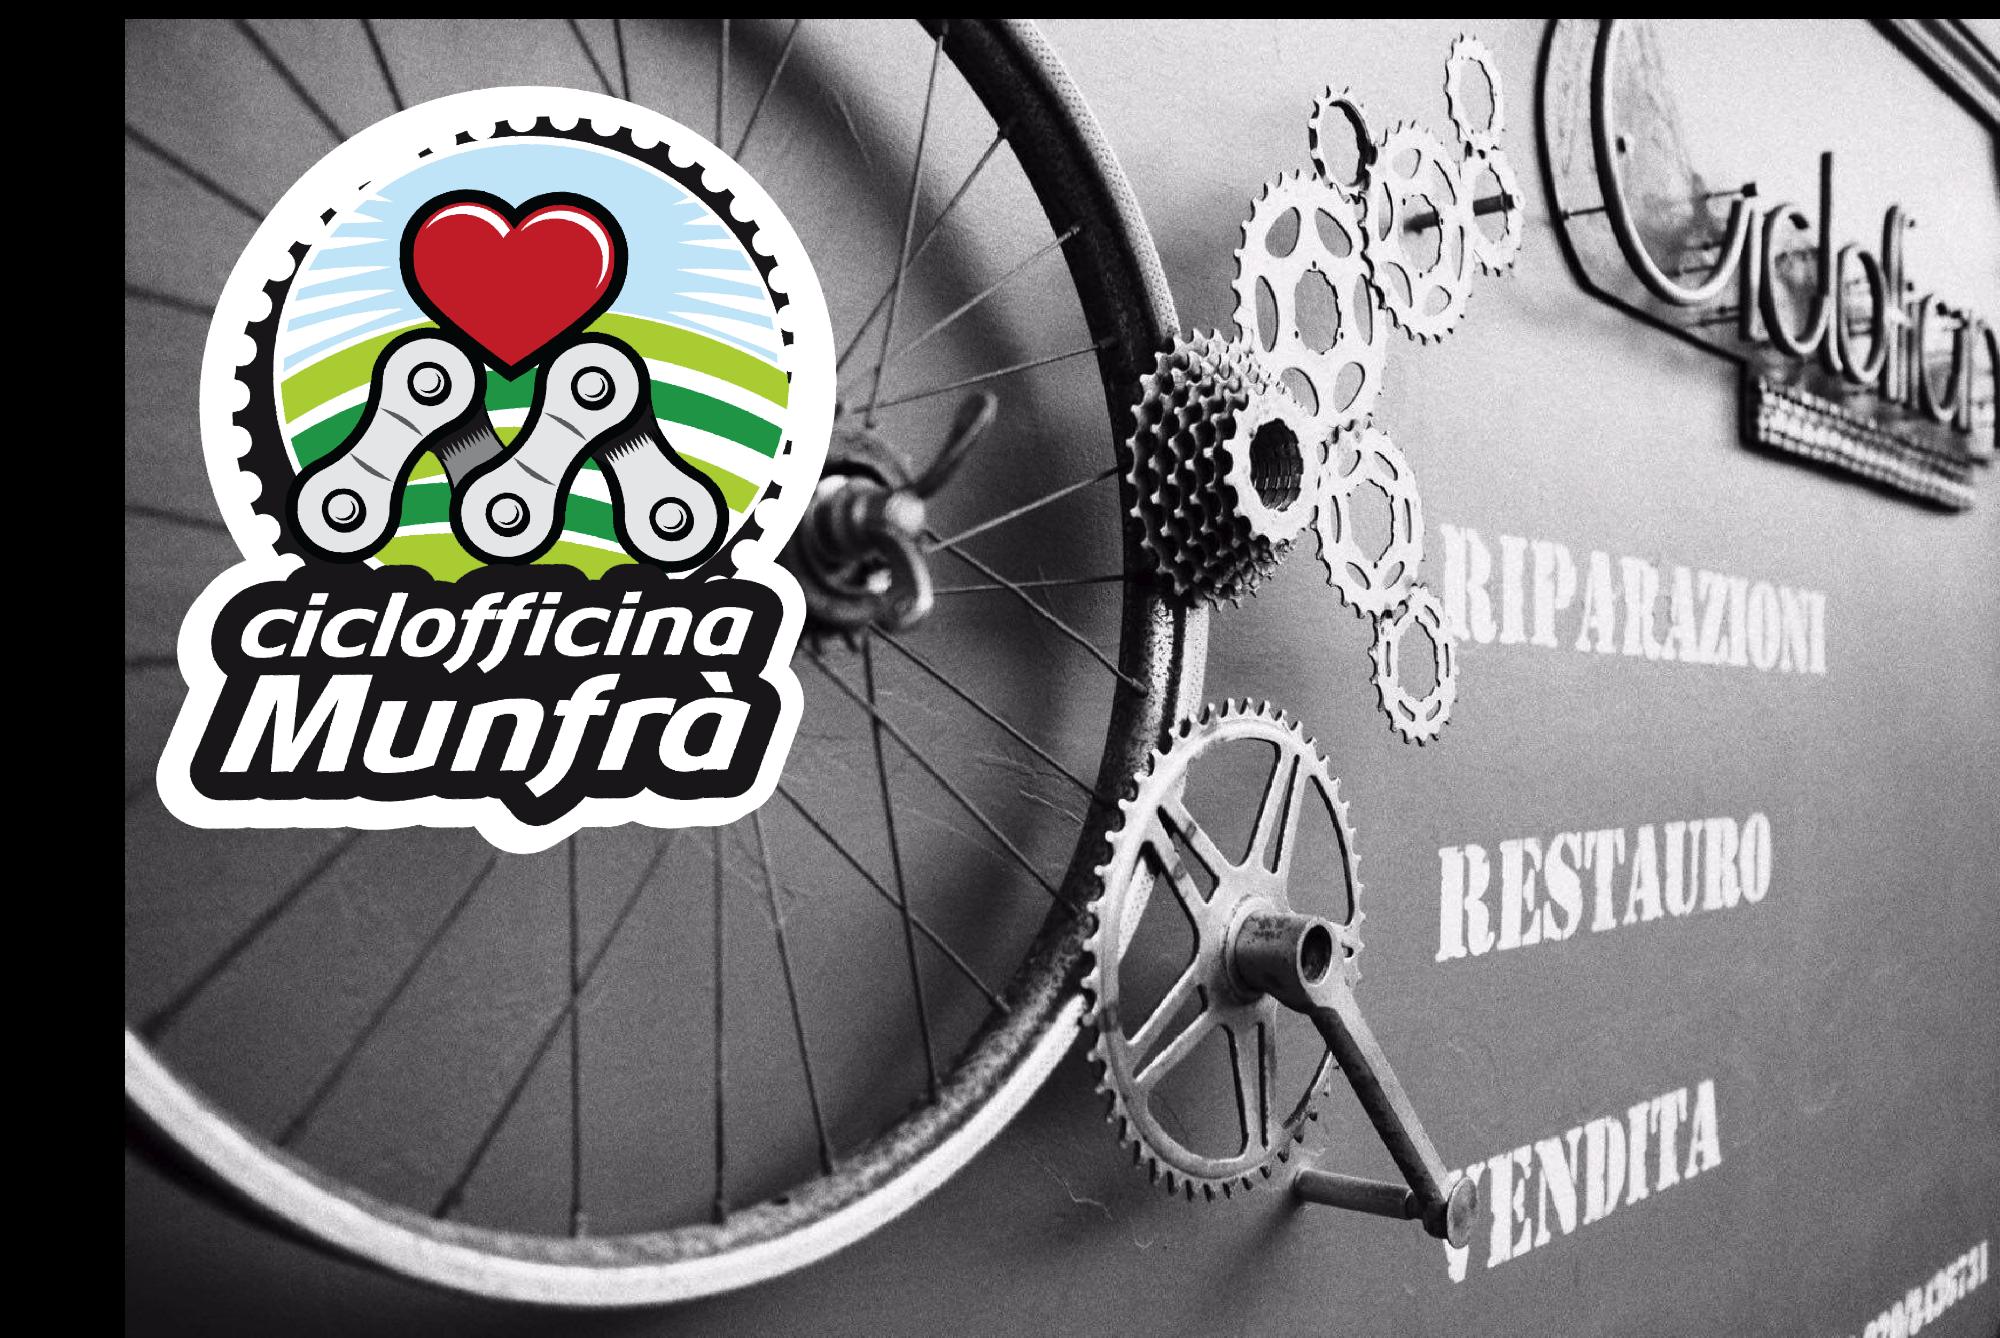 ciclofficina-a-pescata-attilio-pavone-1628349492.png